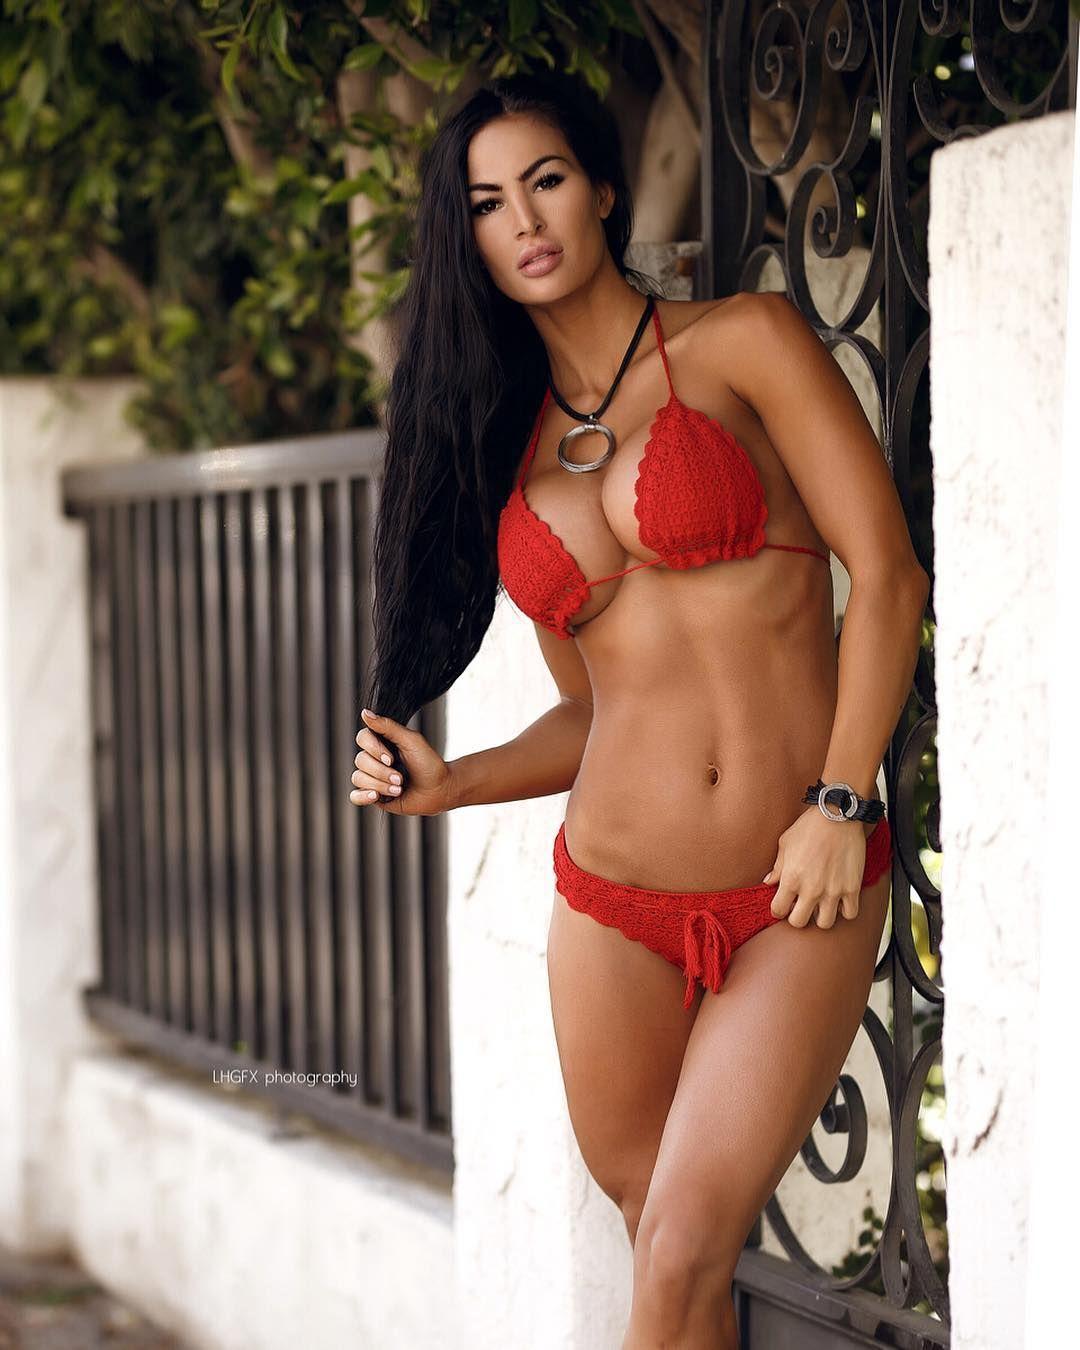 Bikini Daysy Rodriguez Ferreira nude photos 2019